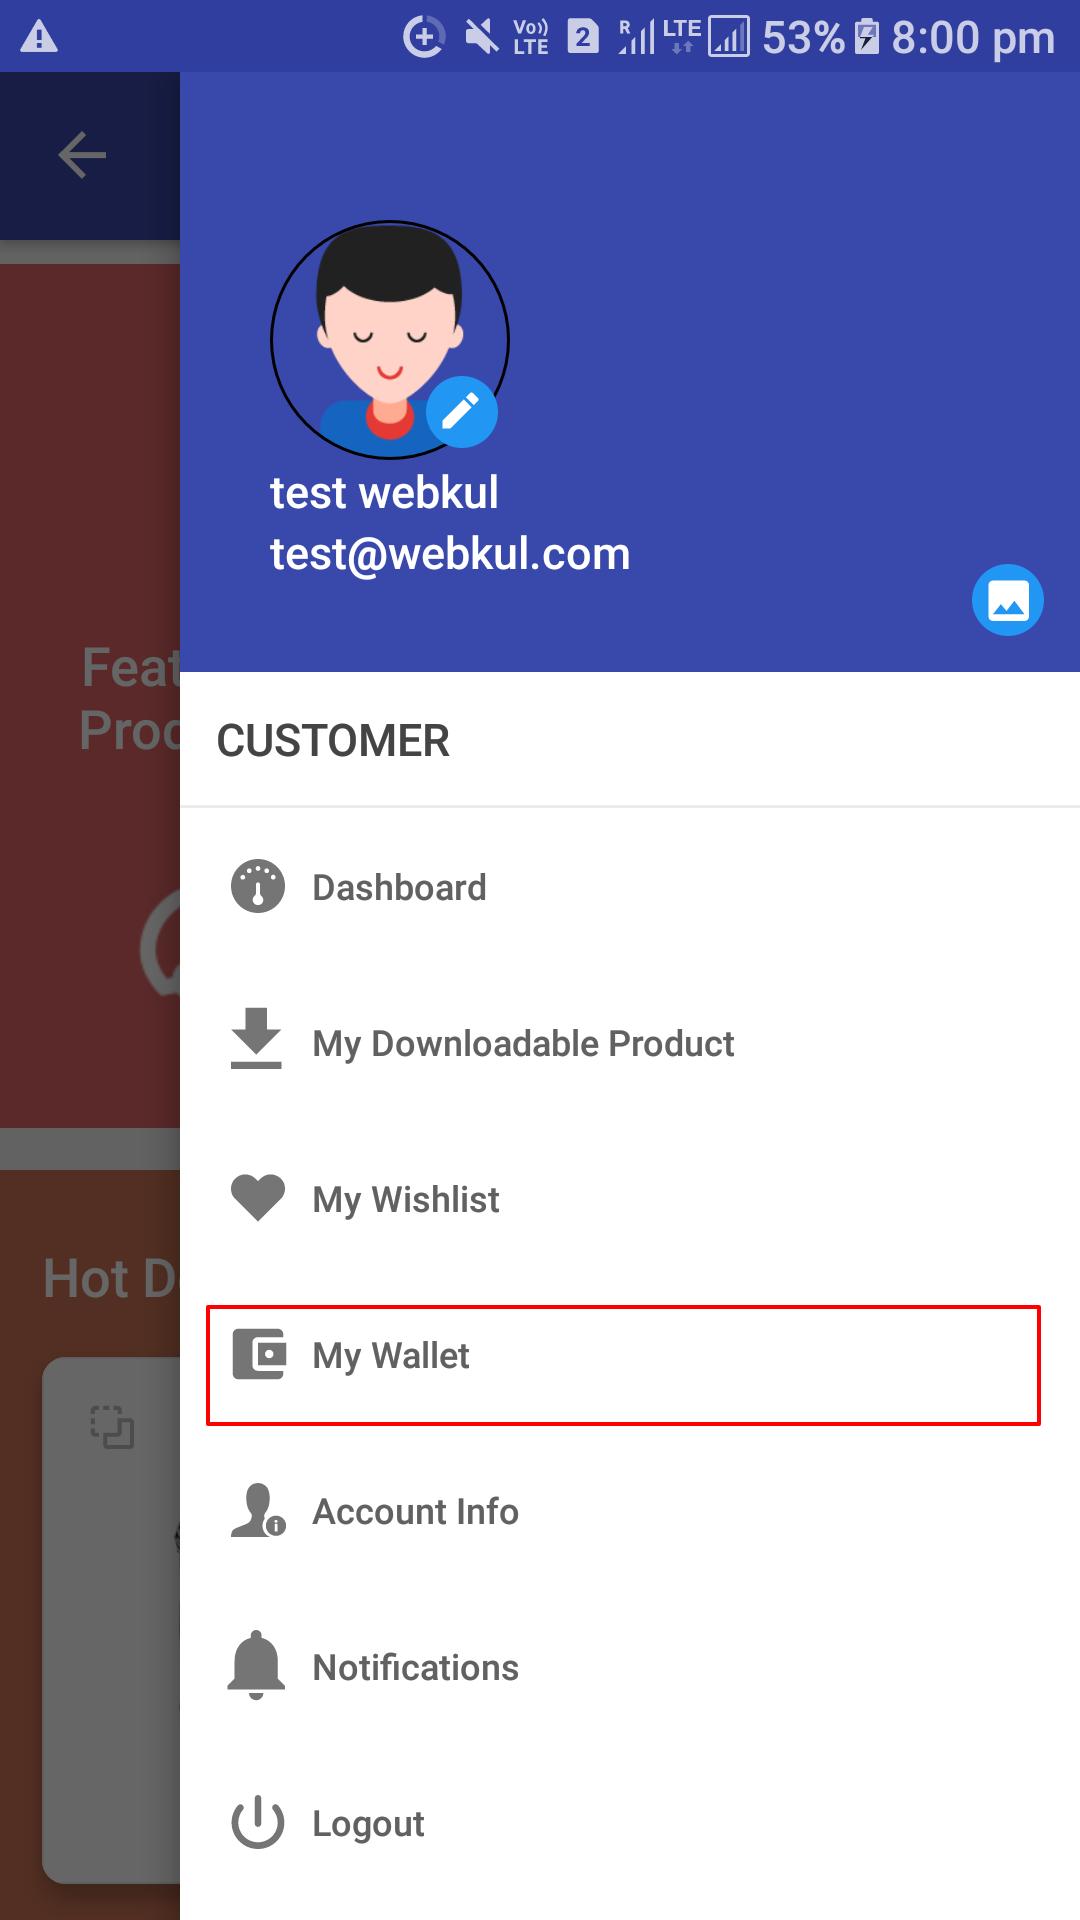 Opencart Mobikul Wallet - Customer Wallet Details Menu Option